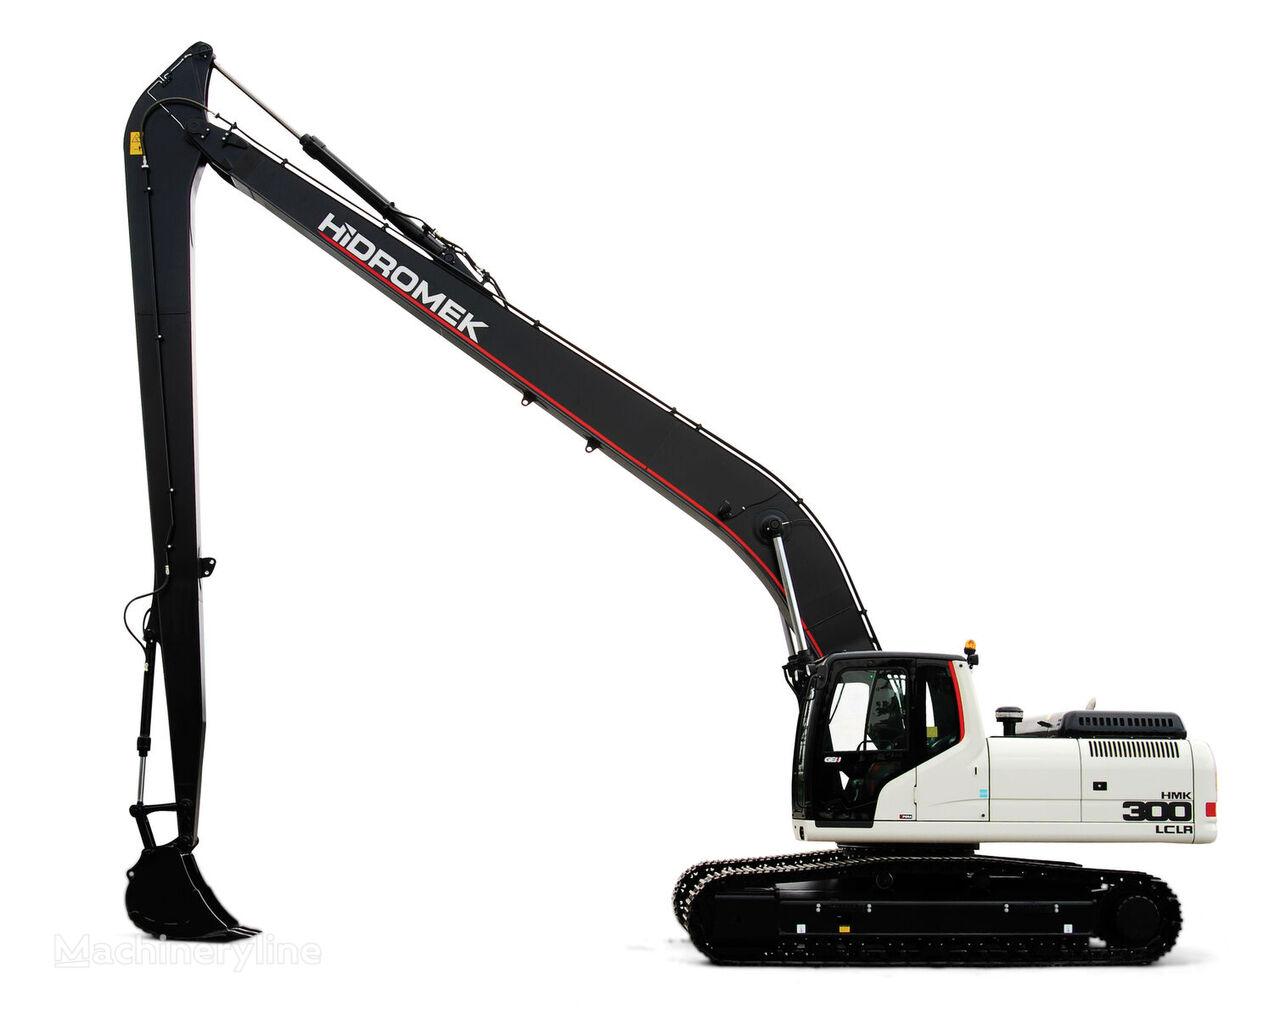 HIDROMEK  HMK 300LC LR excavadora de orugas nueva